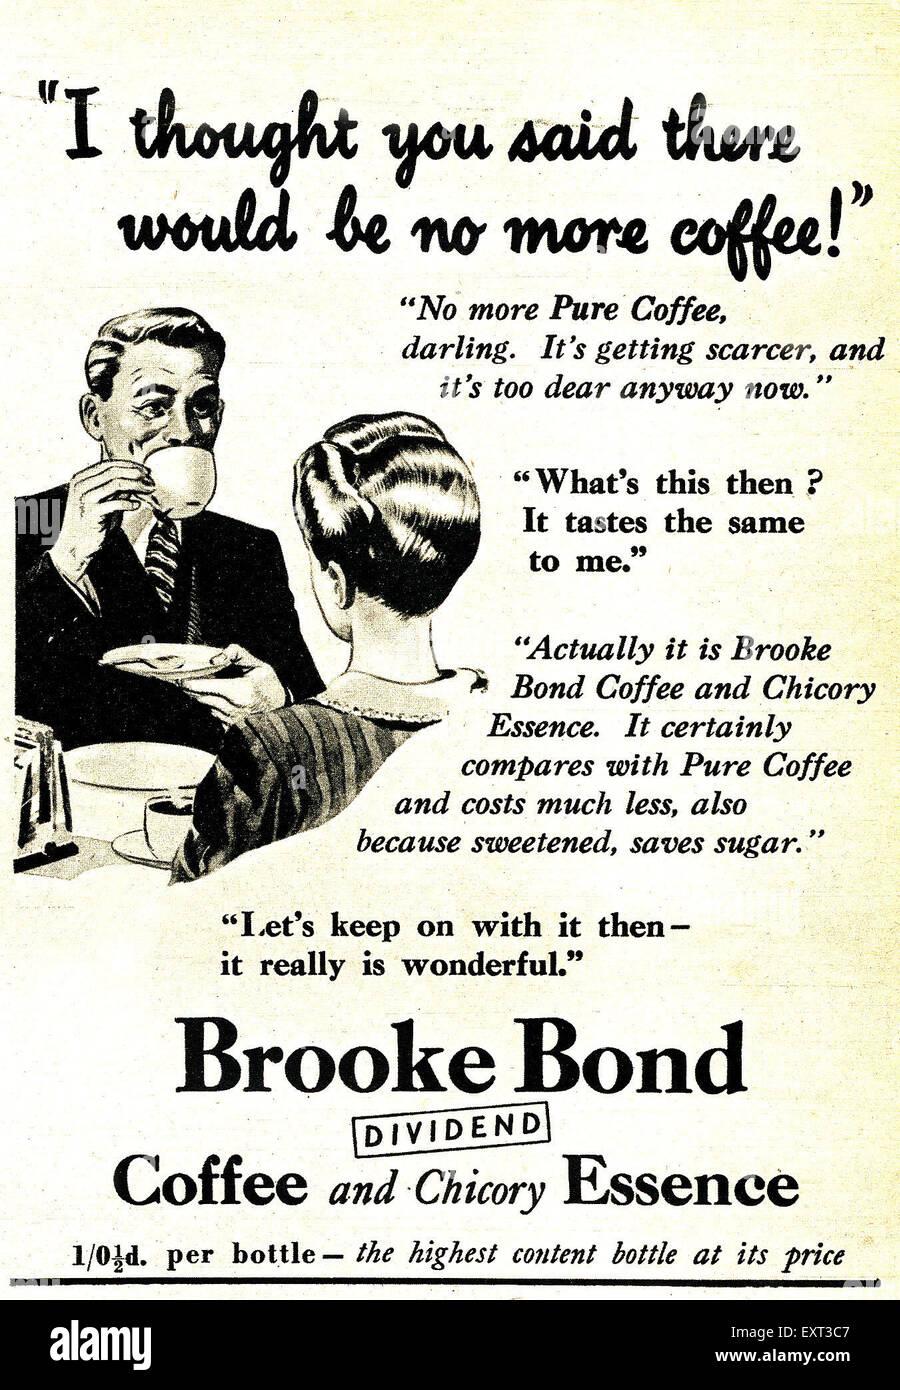 1950s UK Brooke Bond Magazine Advert Stock Photo: 85352071